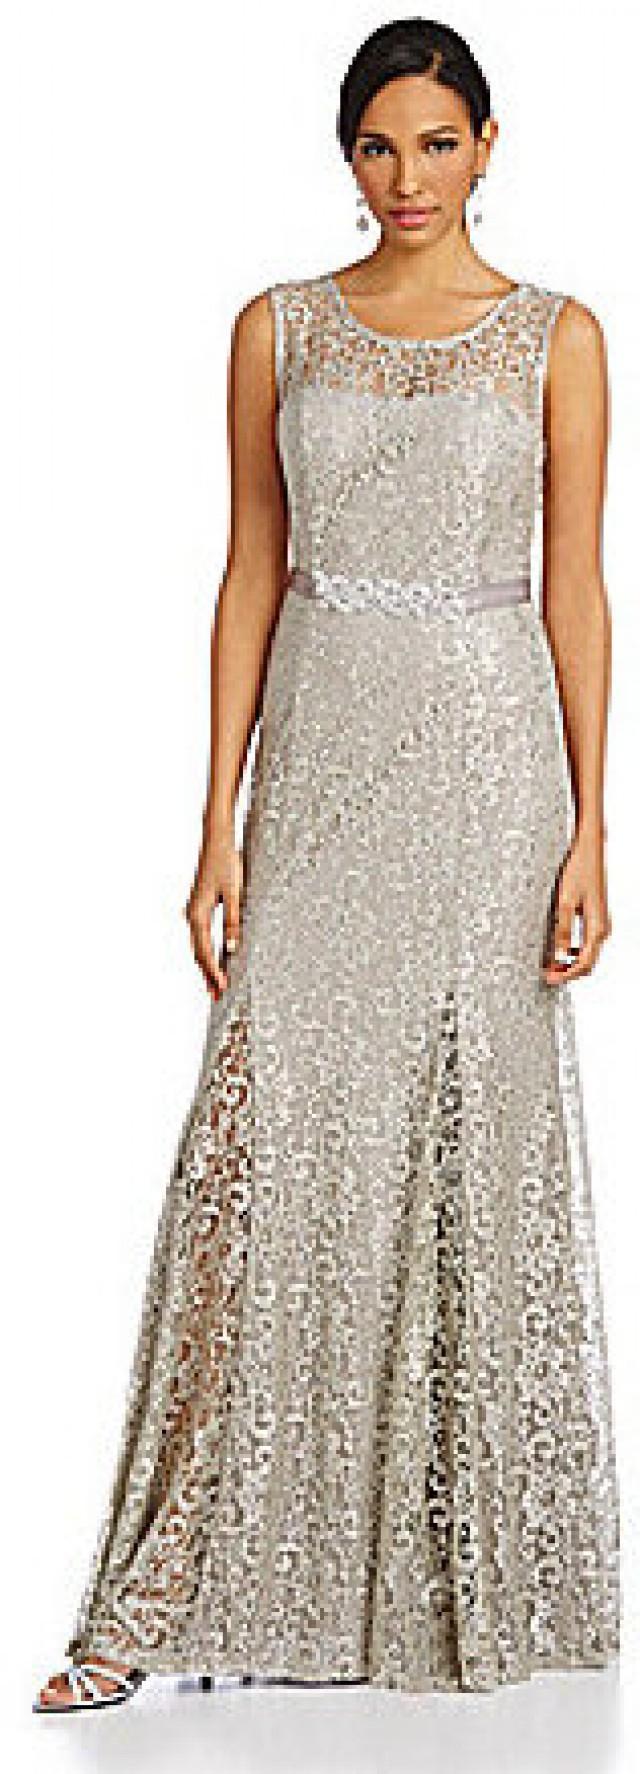 Lace Wedding - Betsy & Adam Beaded Lace Gown #2181817 - Weddbook